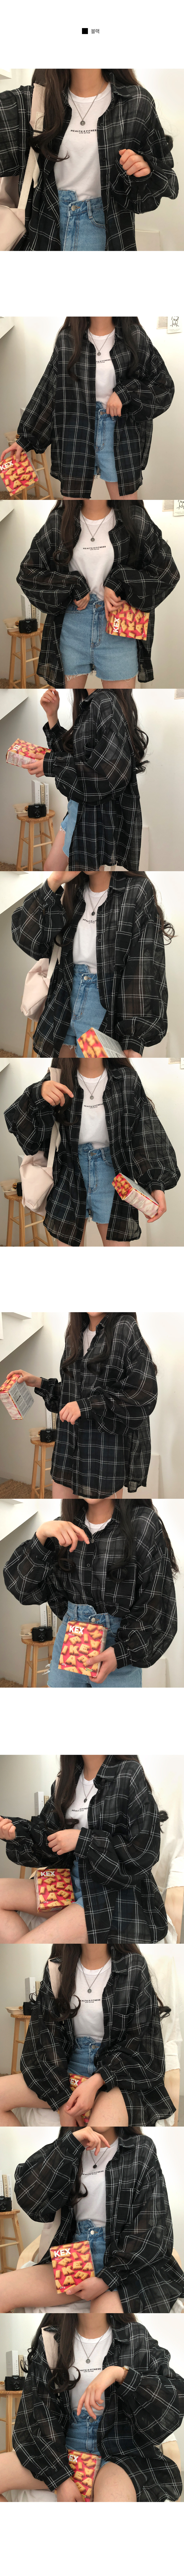 Checkered linen check shirt